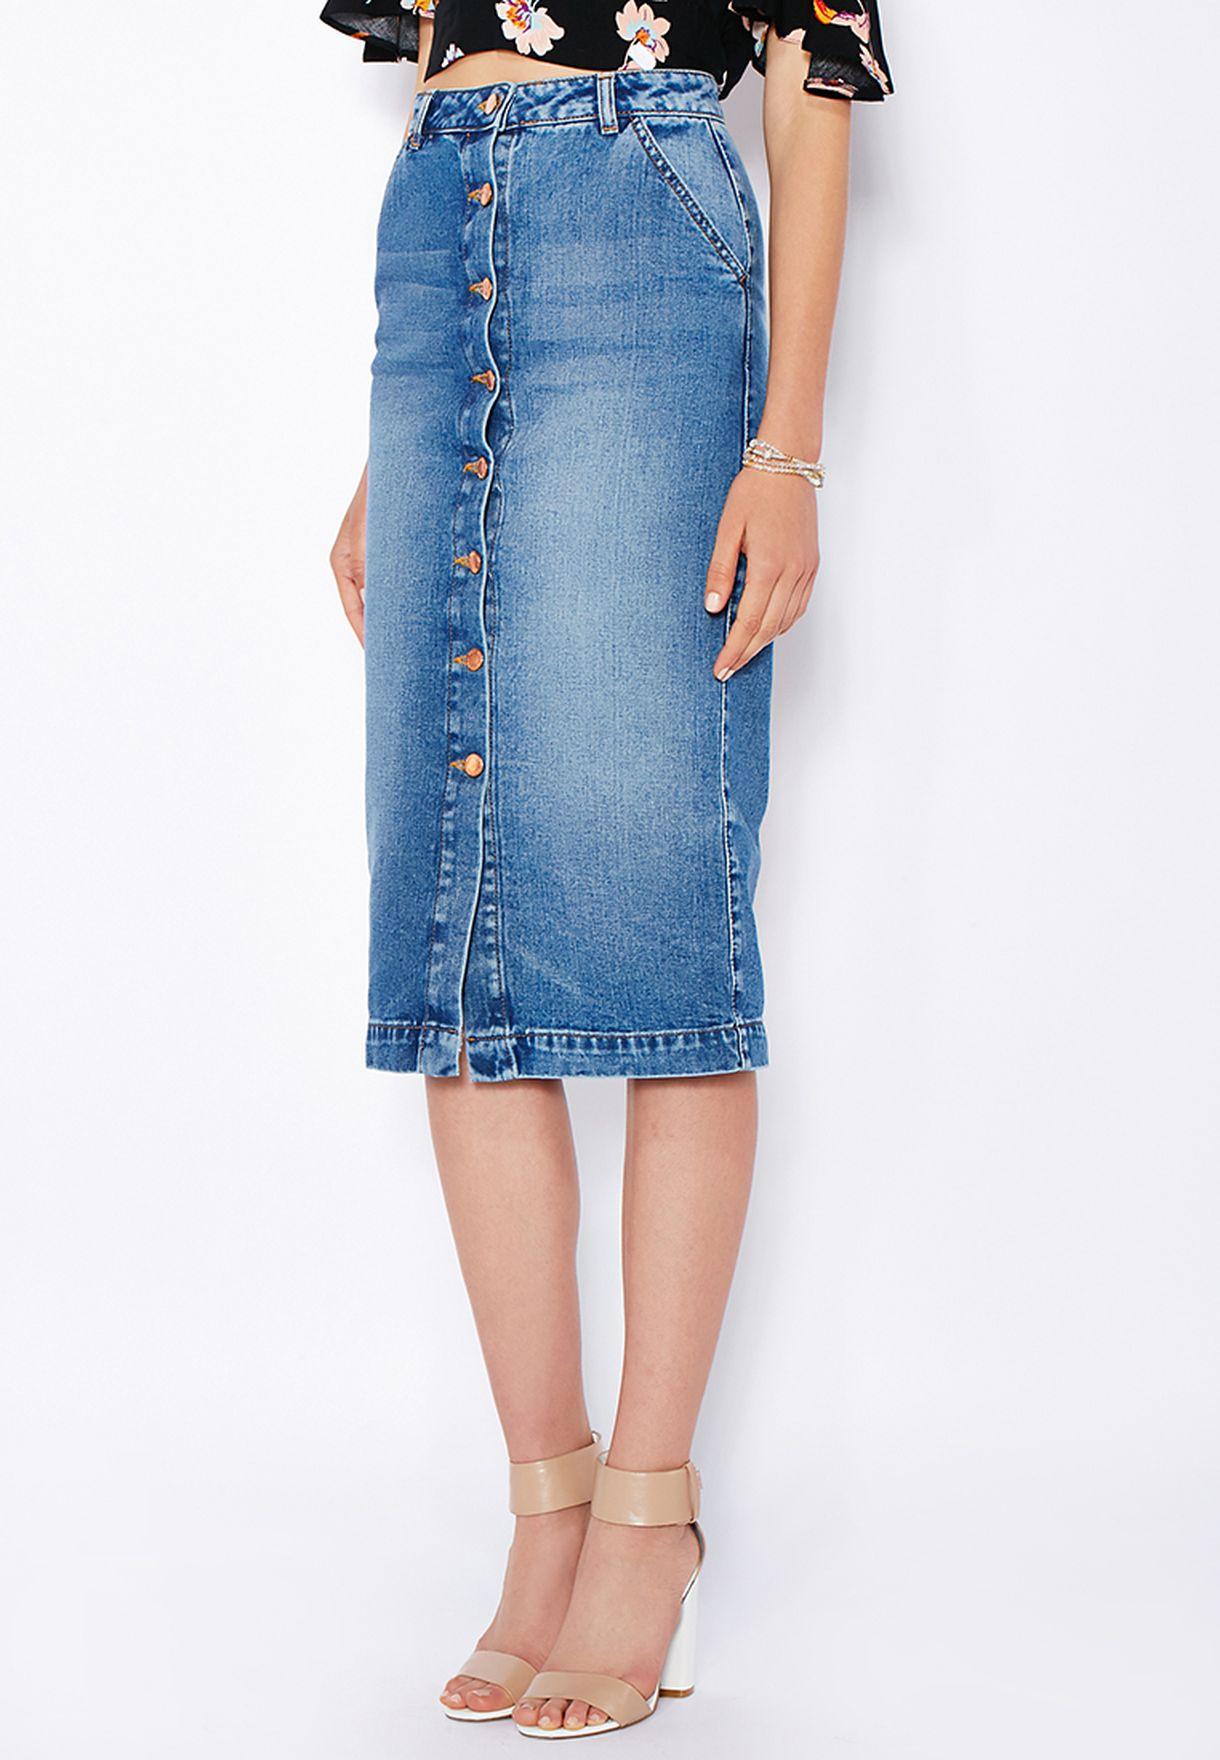 db4d51d1abb4 Shop Miss Selfridge blue Button Down Denim Midi Skirt 11K10QMDT for ...